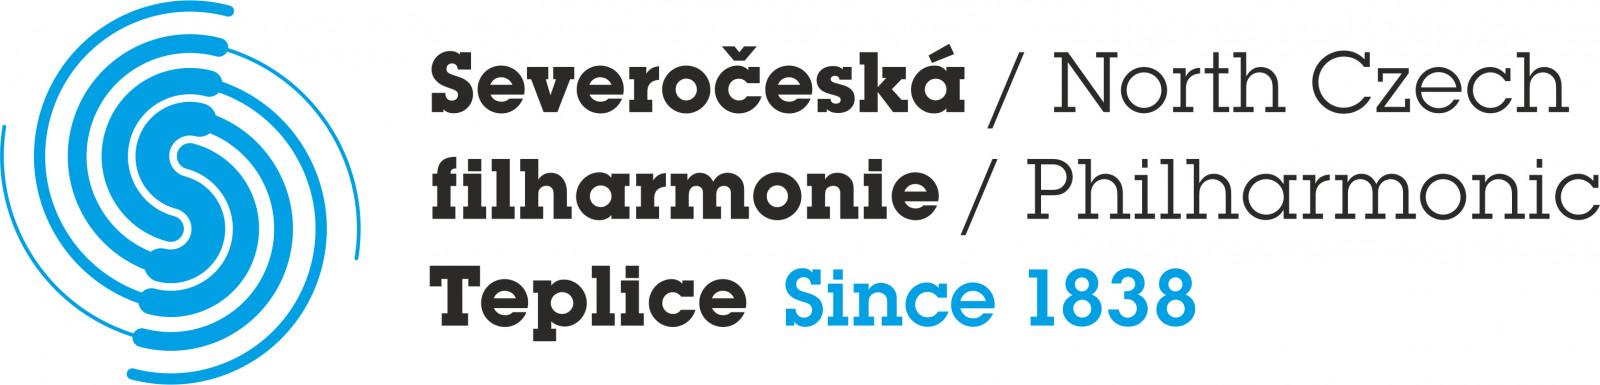 SCF Teplice logo blue